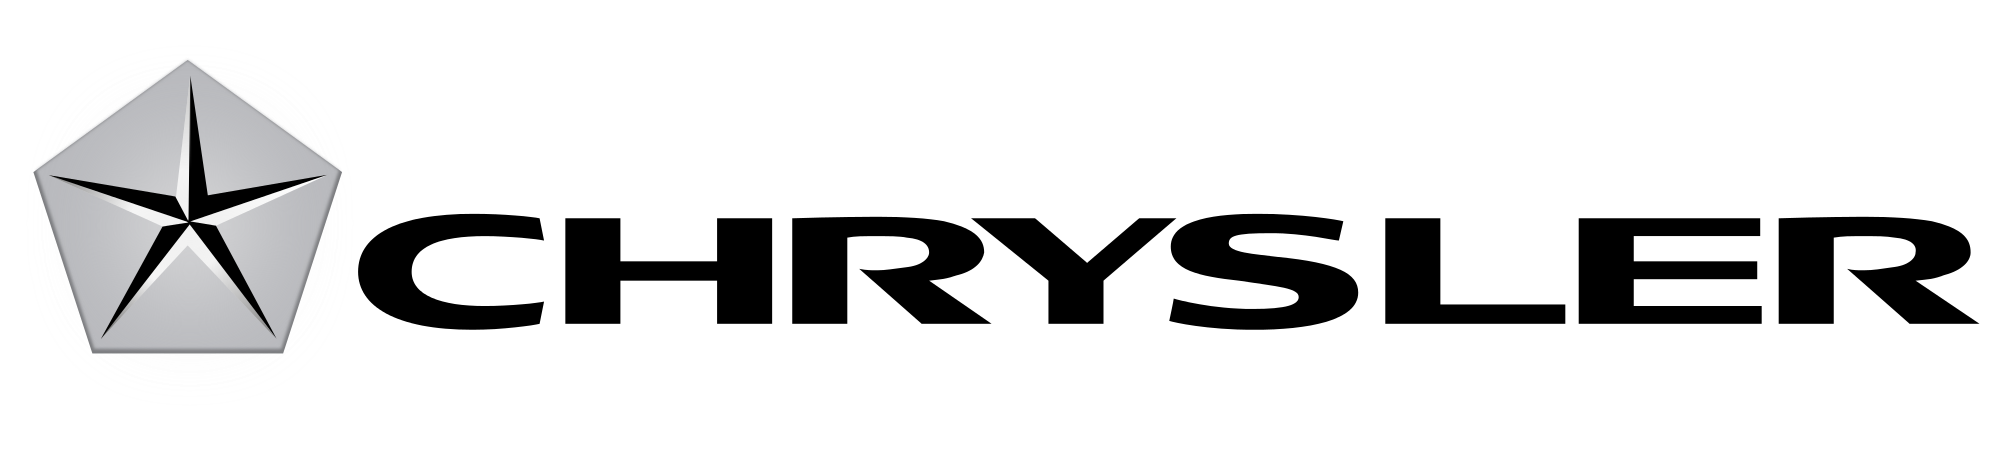 Chrysler-logo-American-car-brands.png